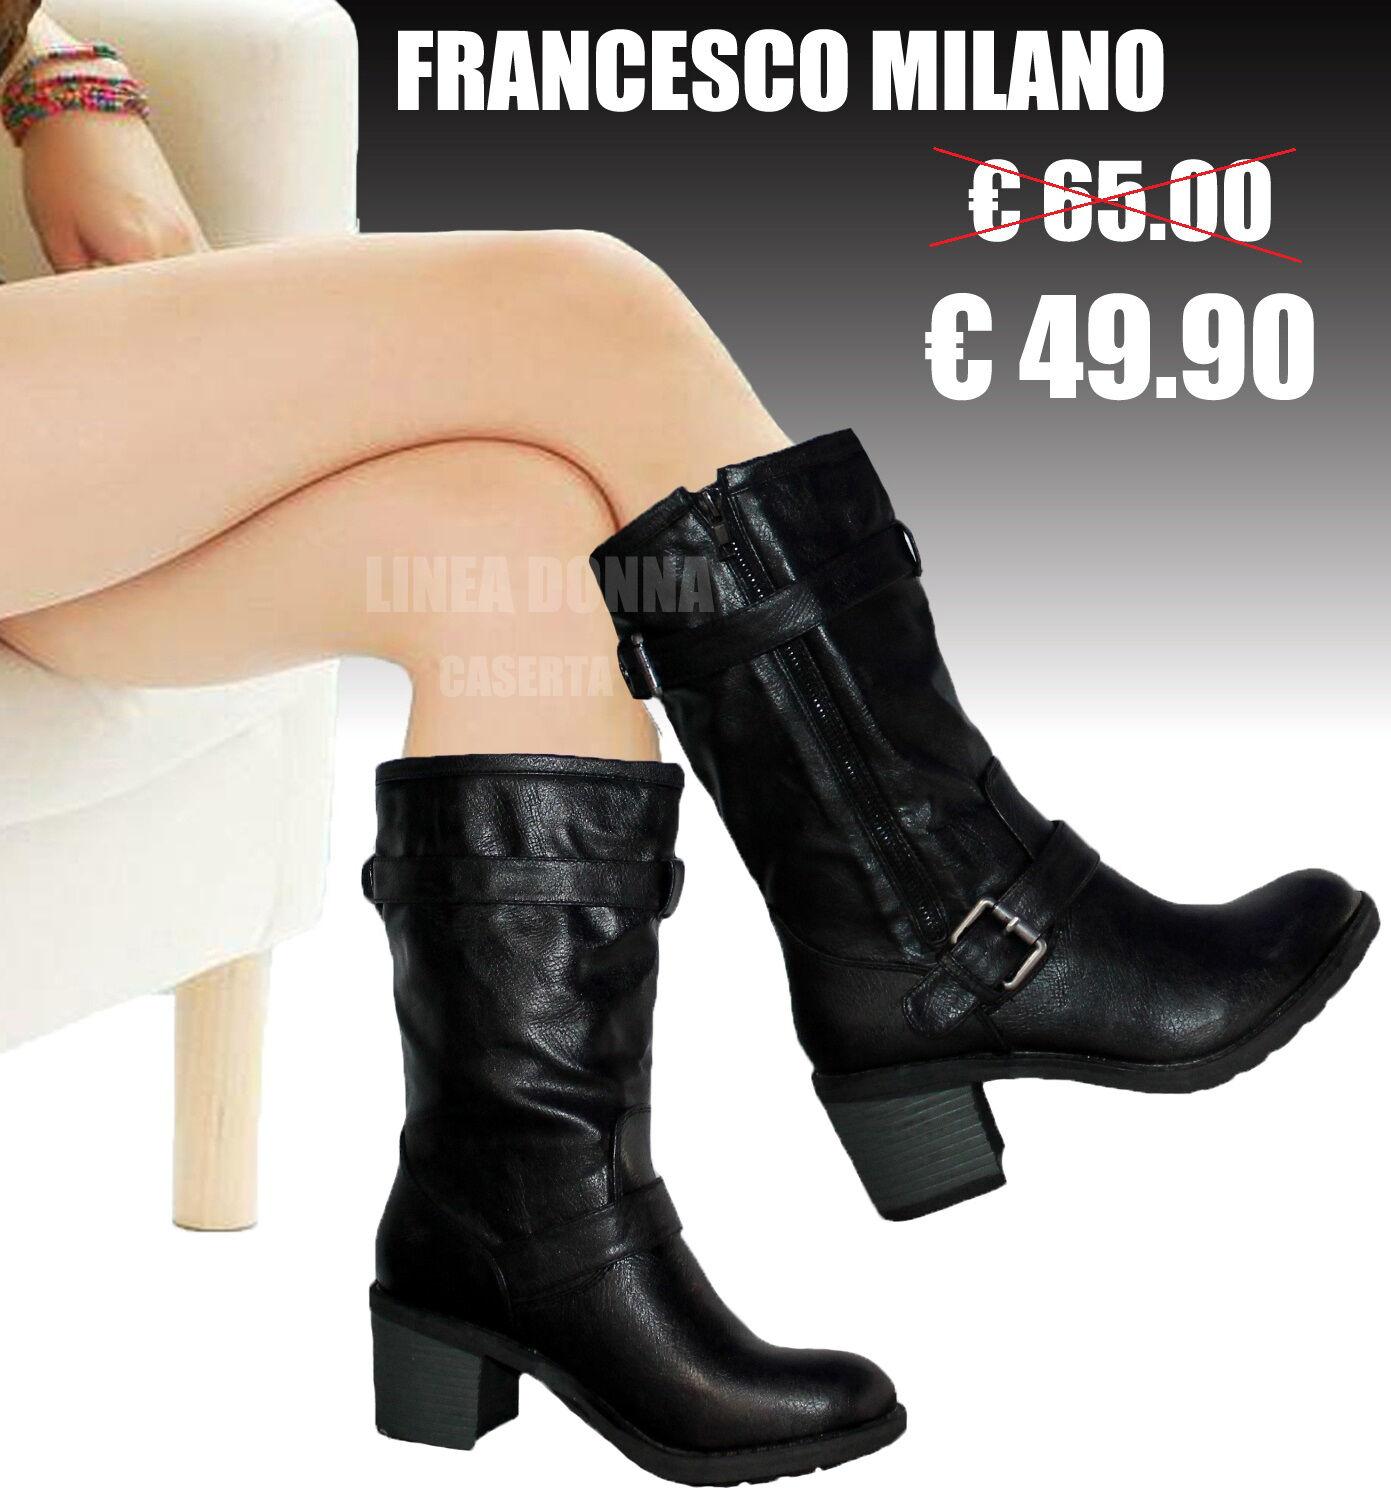 Stivali Stivaletti Biker boots women FRANCESCO MILANO numero 37 38 39 40 41